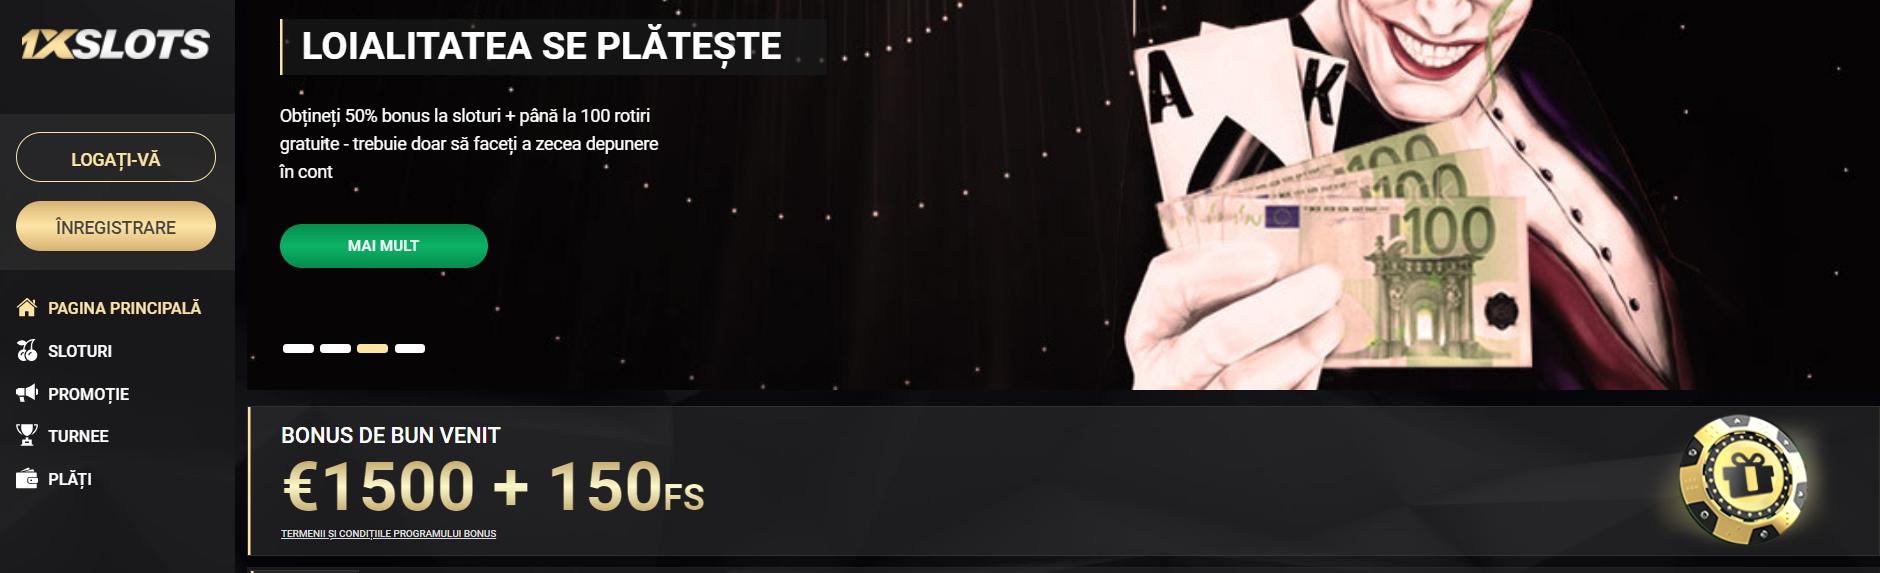 1xSlots cazino